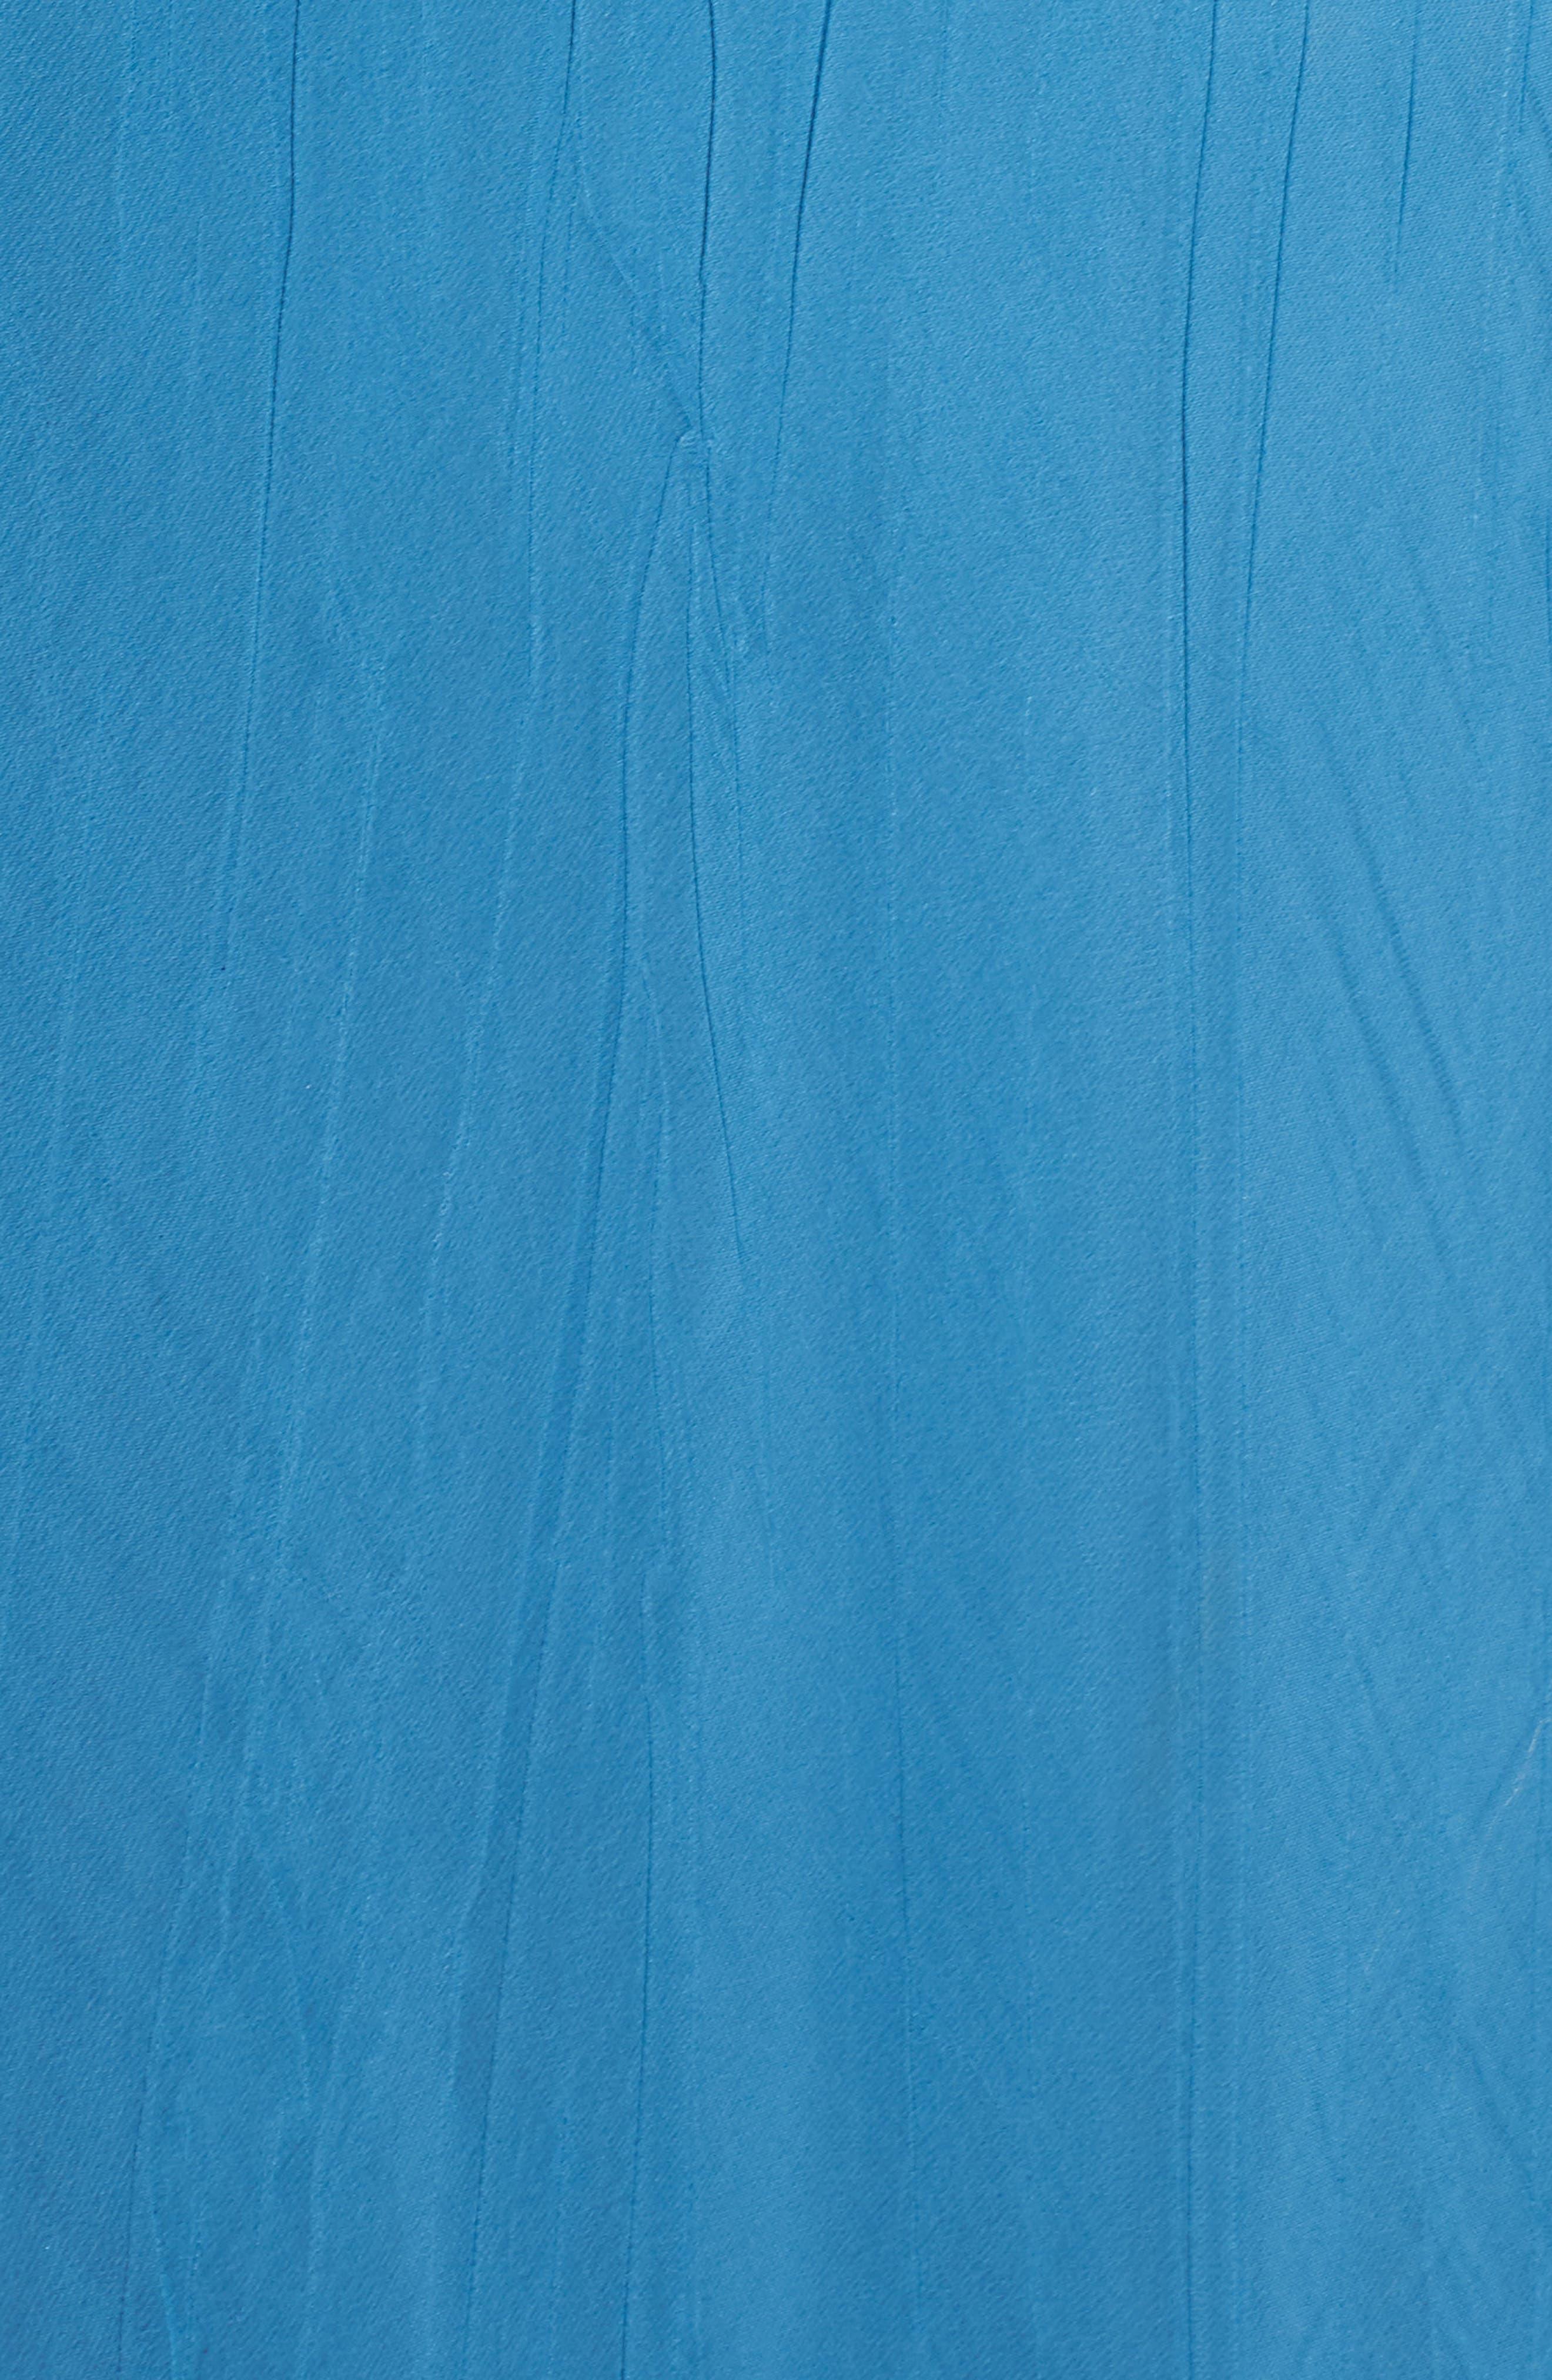 Beaded Neck Asymmetrical Charmeuse A-Line Dress,                             Alternate thumbnail 5, color,                             407